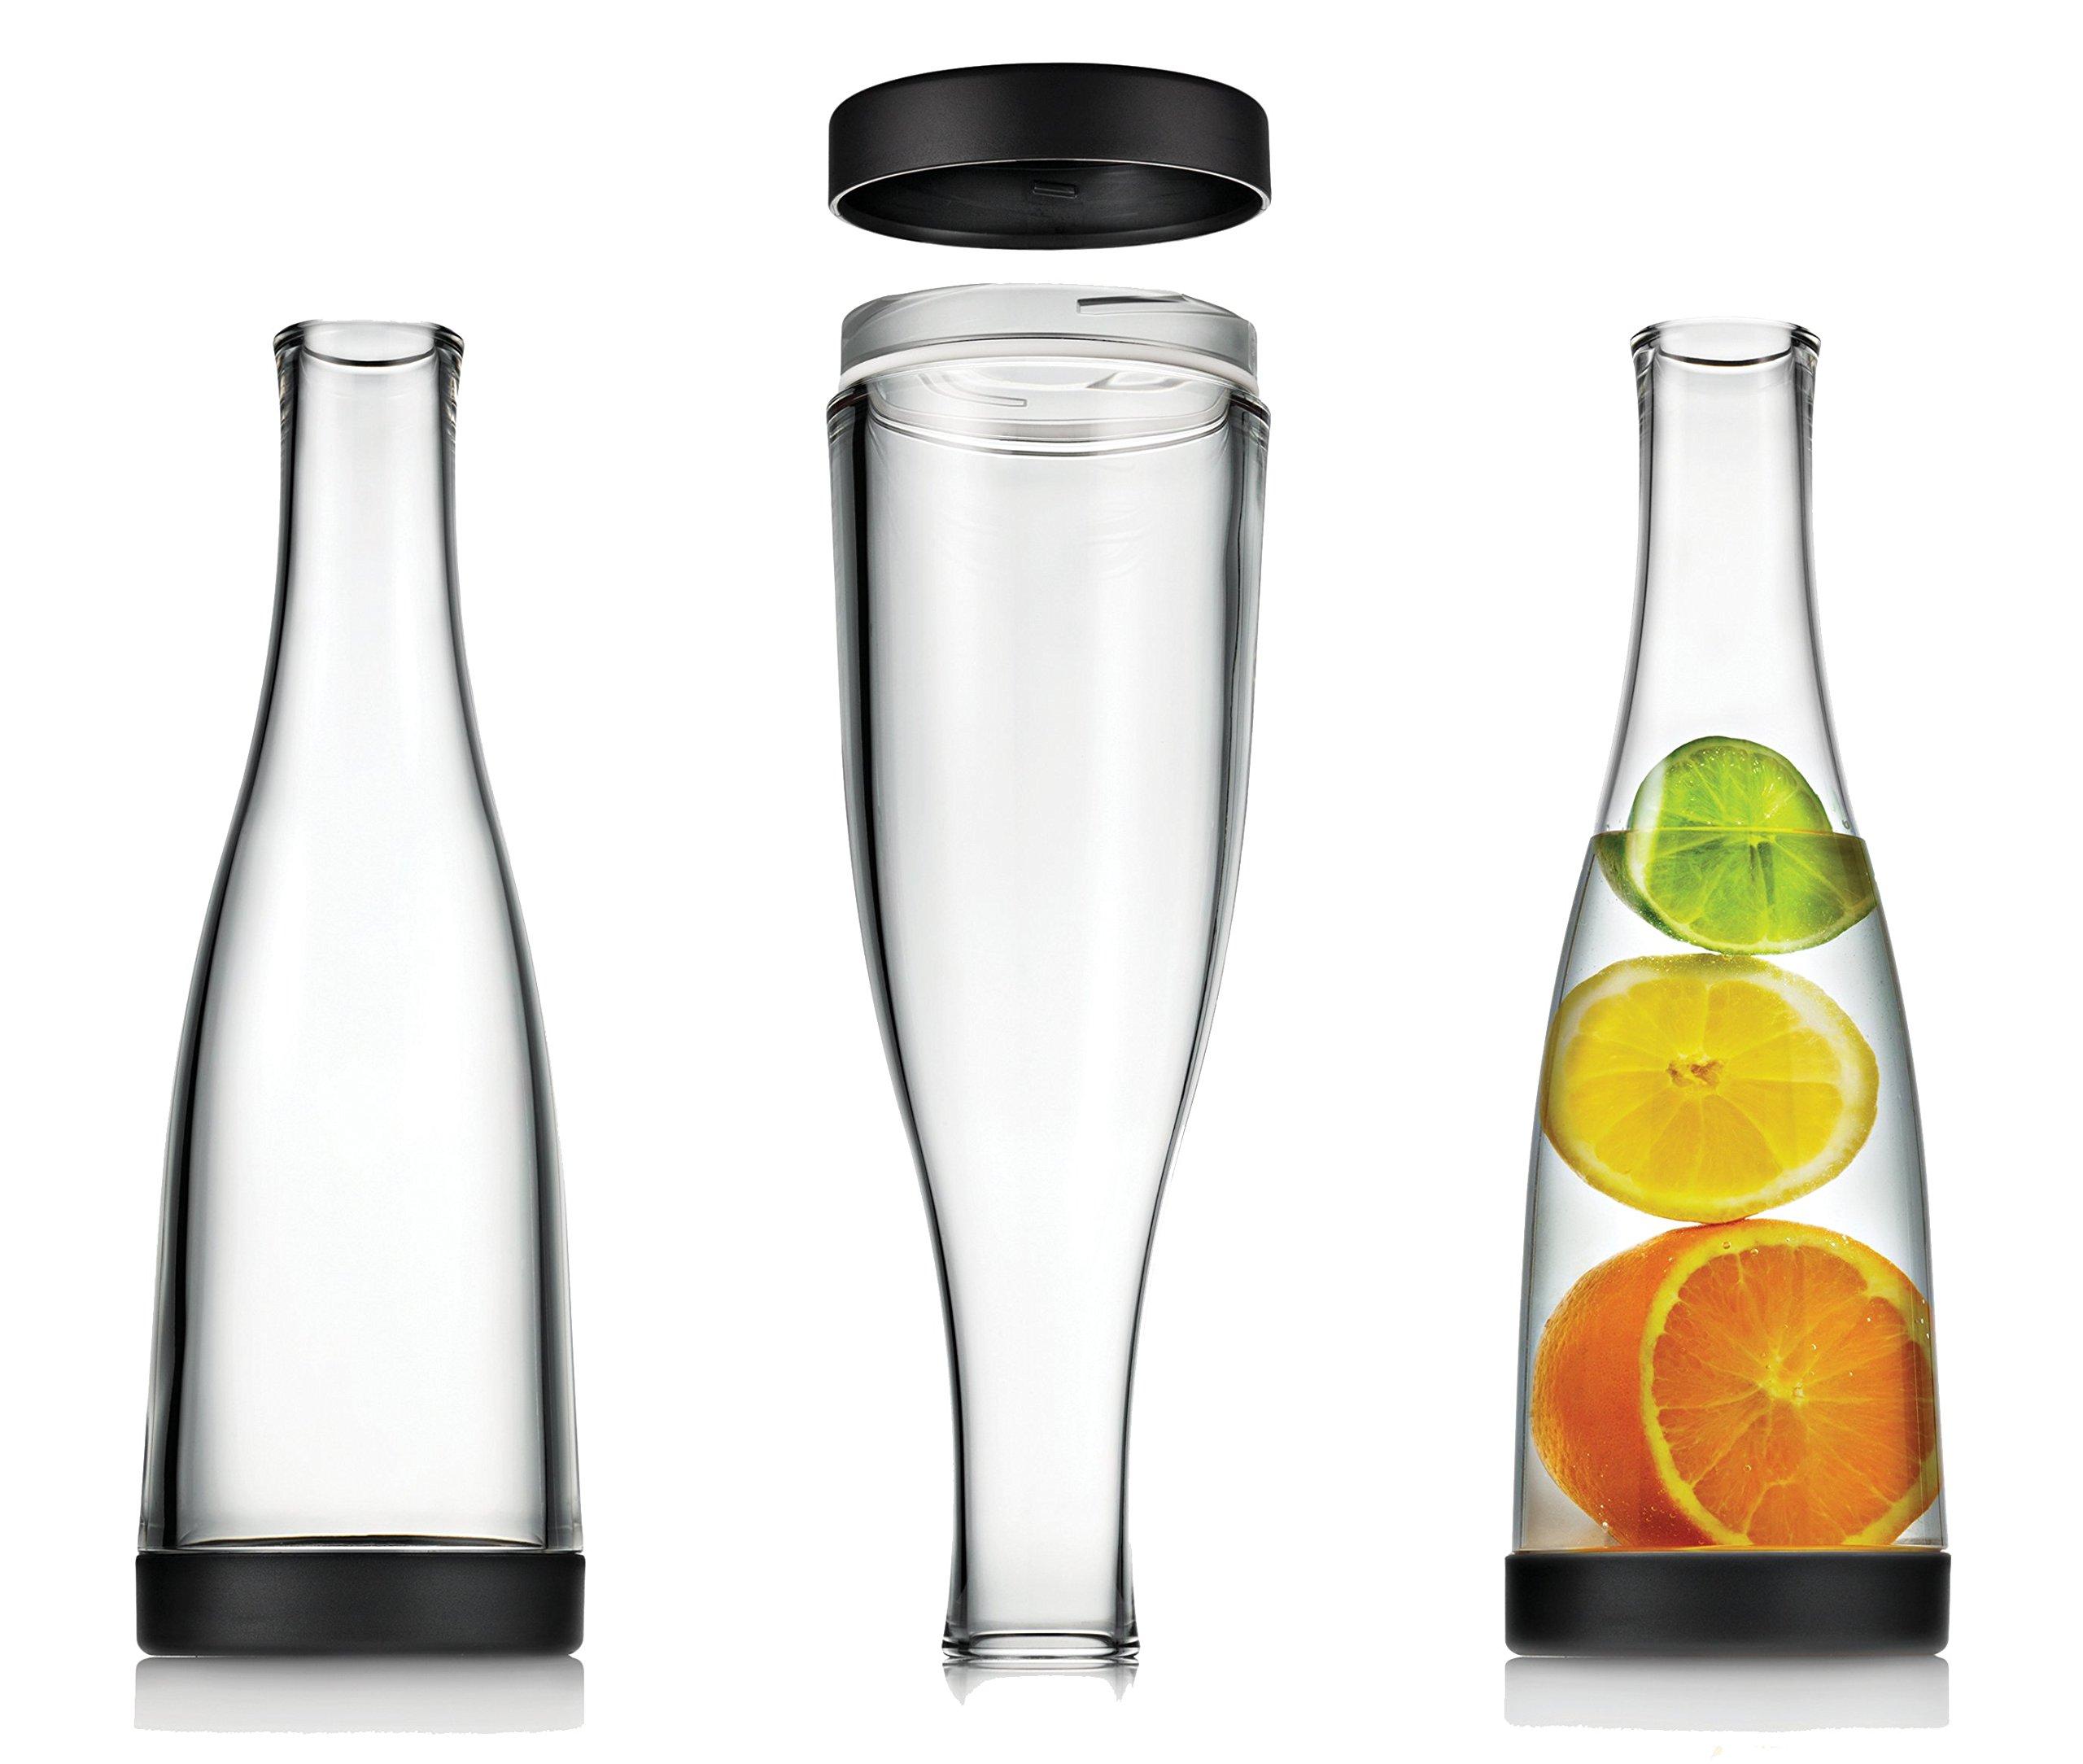 Drinique SRV-CA-CLR-12 Beverage Service Easy Clean Carafe Decanter, 32 oz (Case of 12), Clear